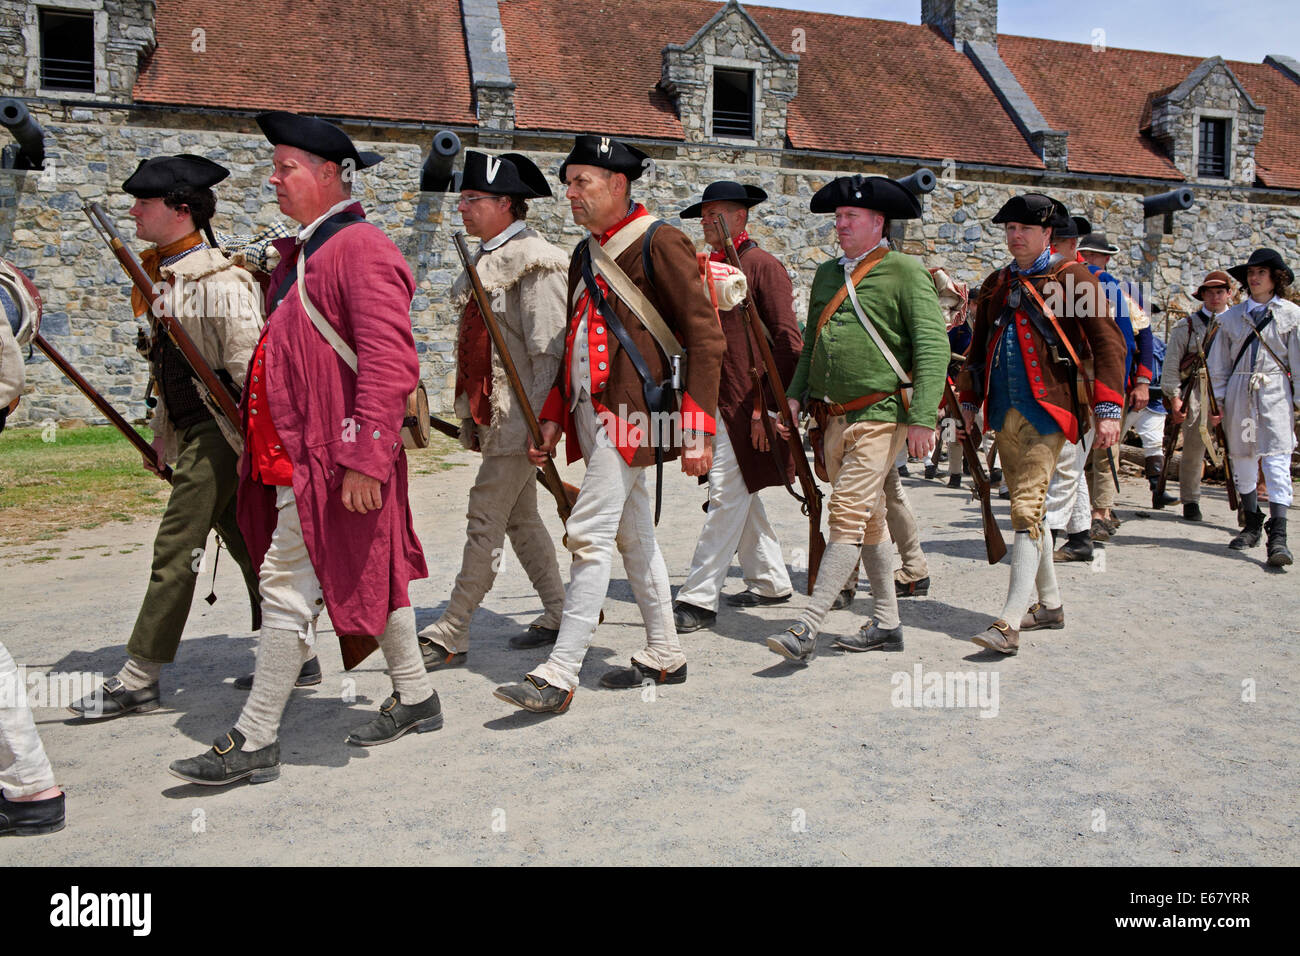 American Revolutionary War Uniform Stock Photos & American